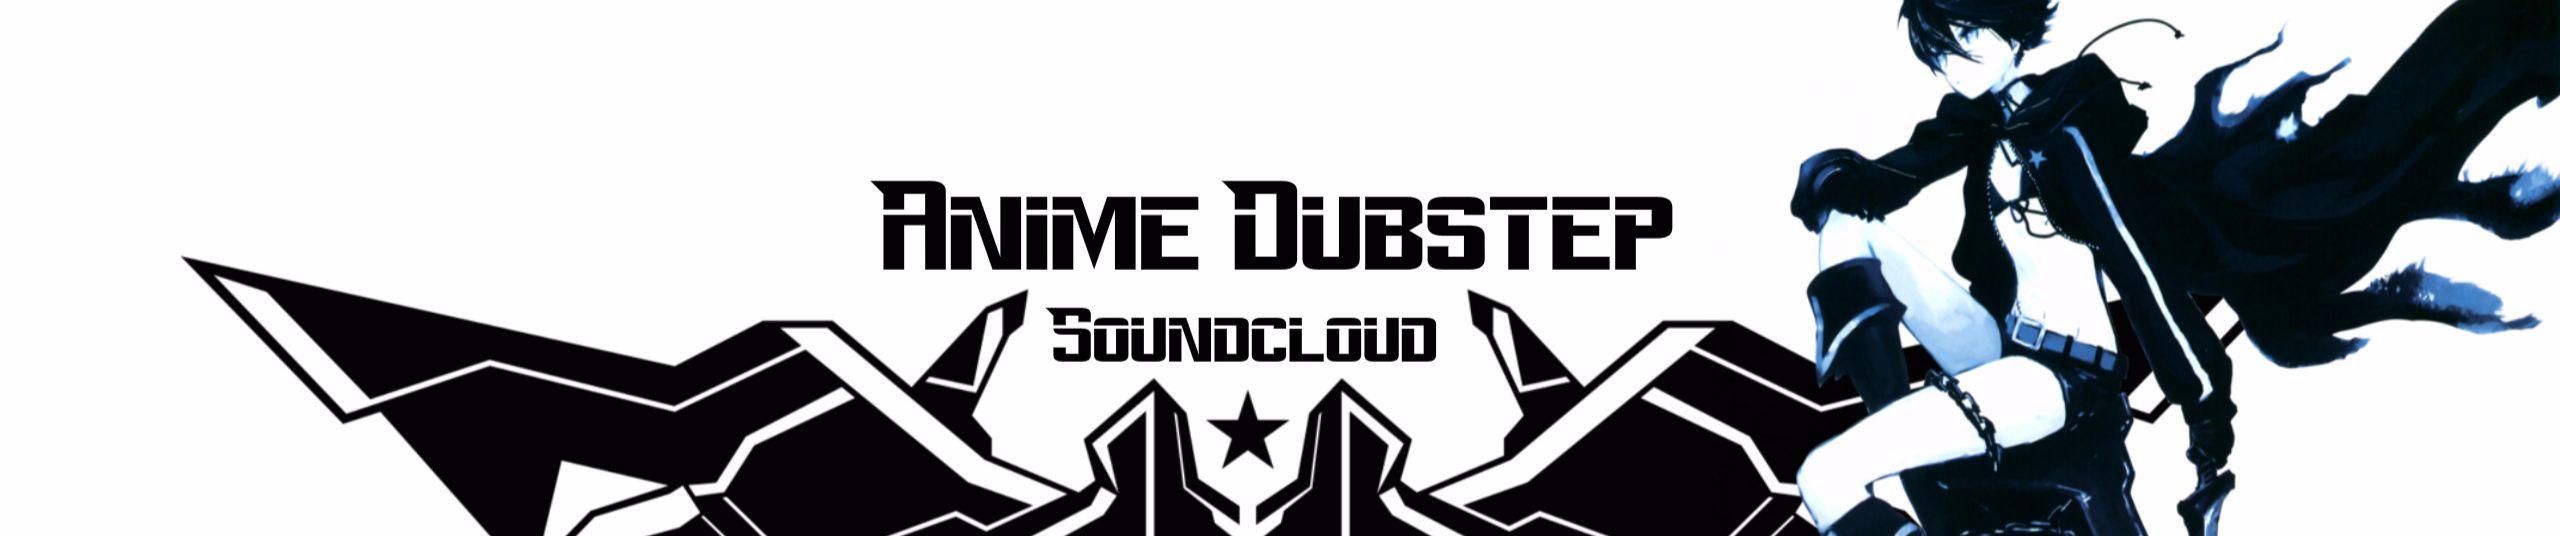 anime dubstep free listening on soundcloud